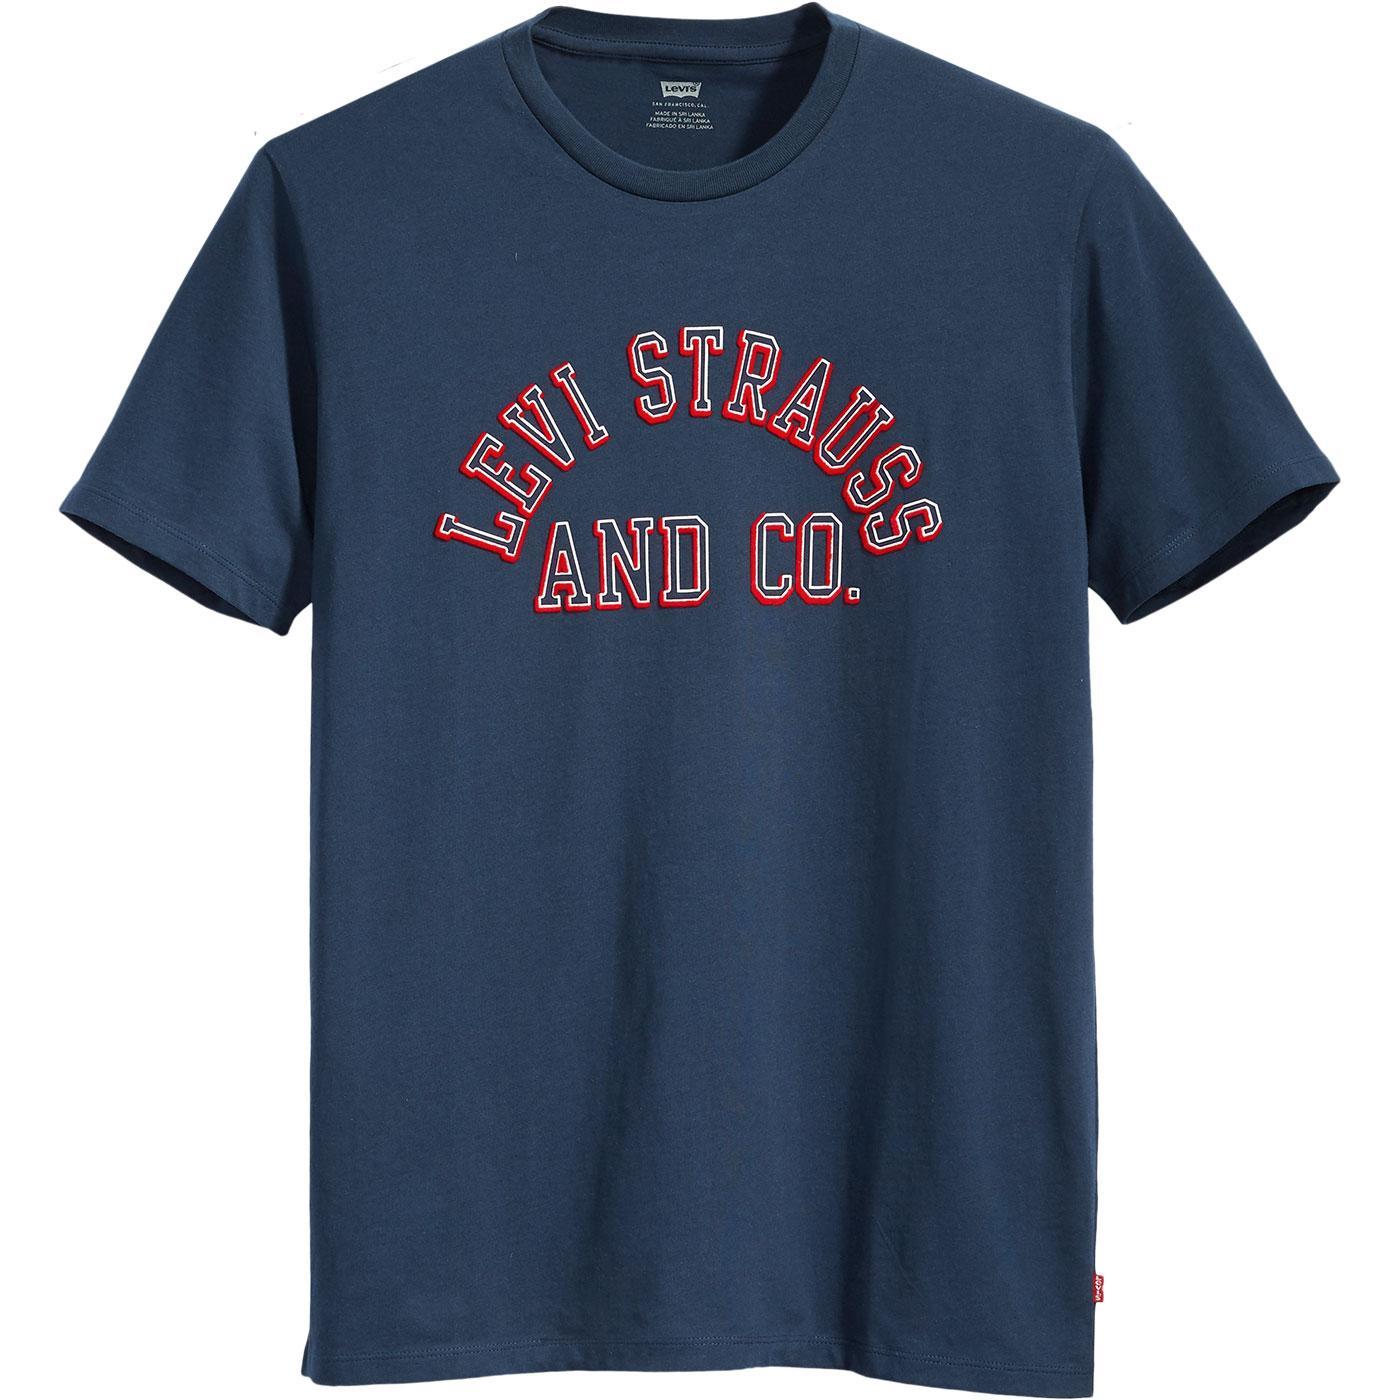 LEVI'S Retro 70s Varsity Athletics T-Shirt (Navy)